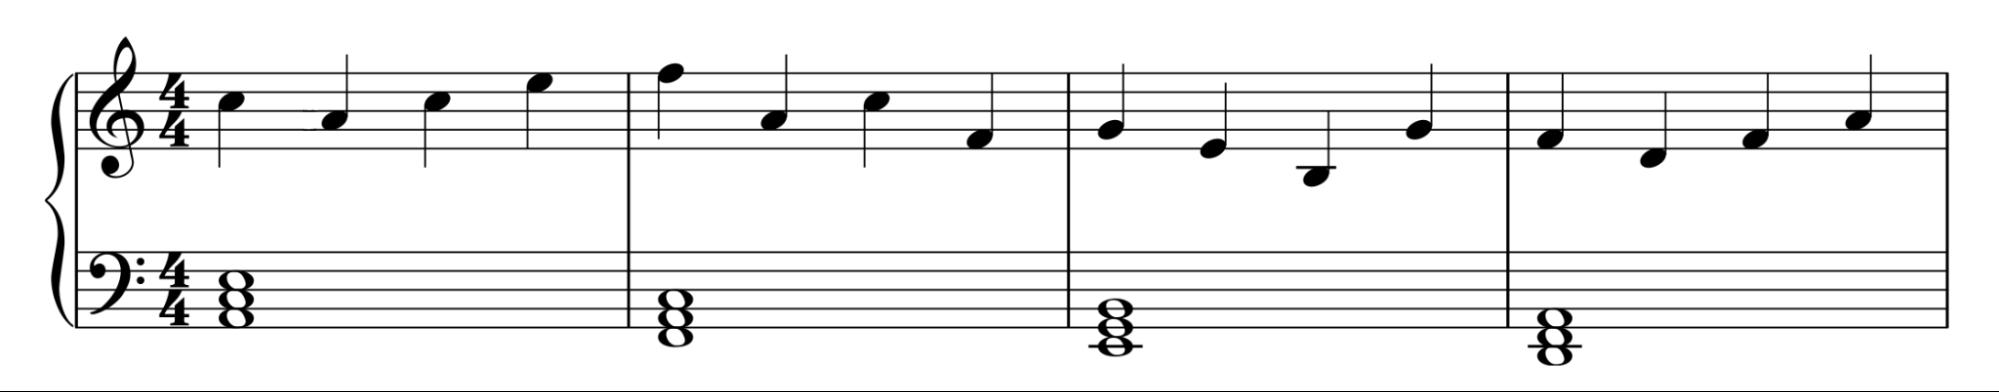 learn treble clef